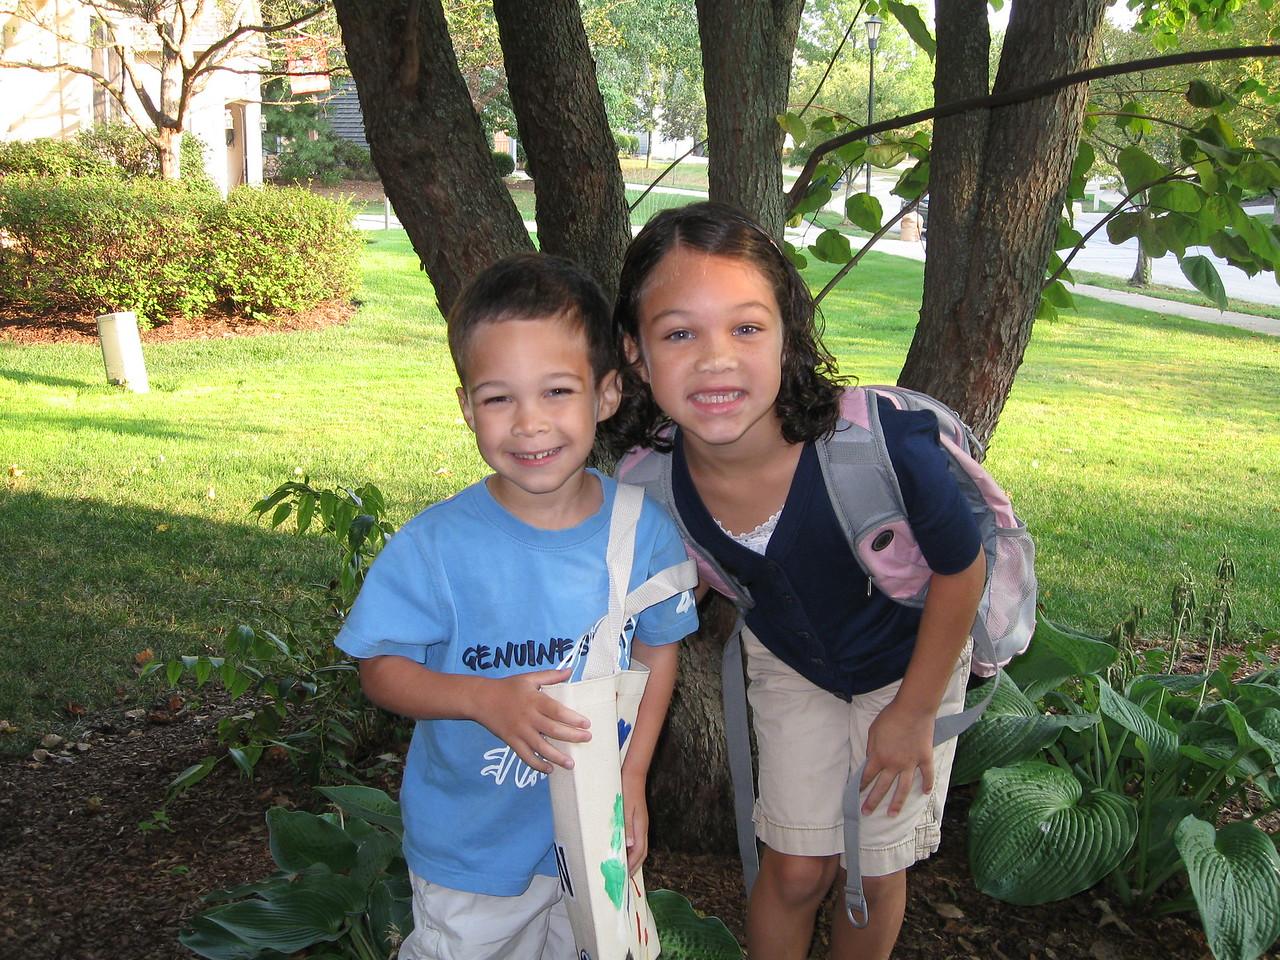 Kellen's first day of preschool